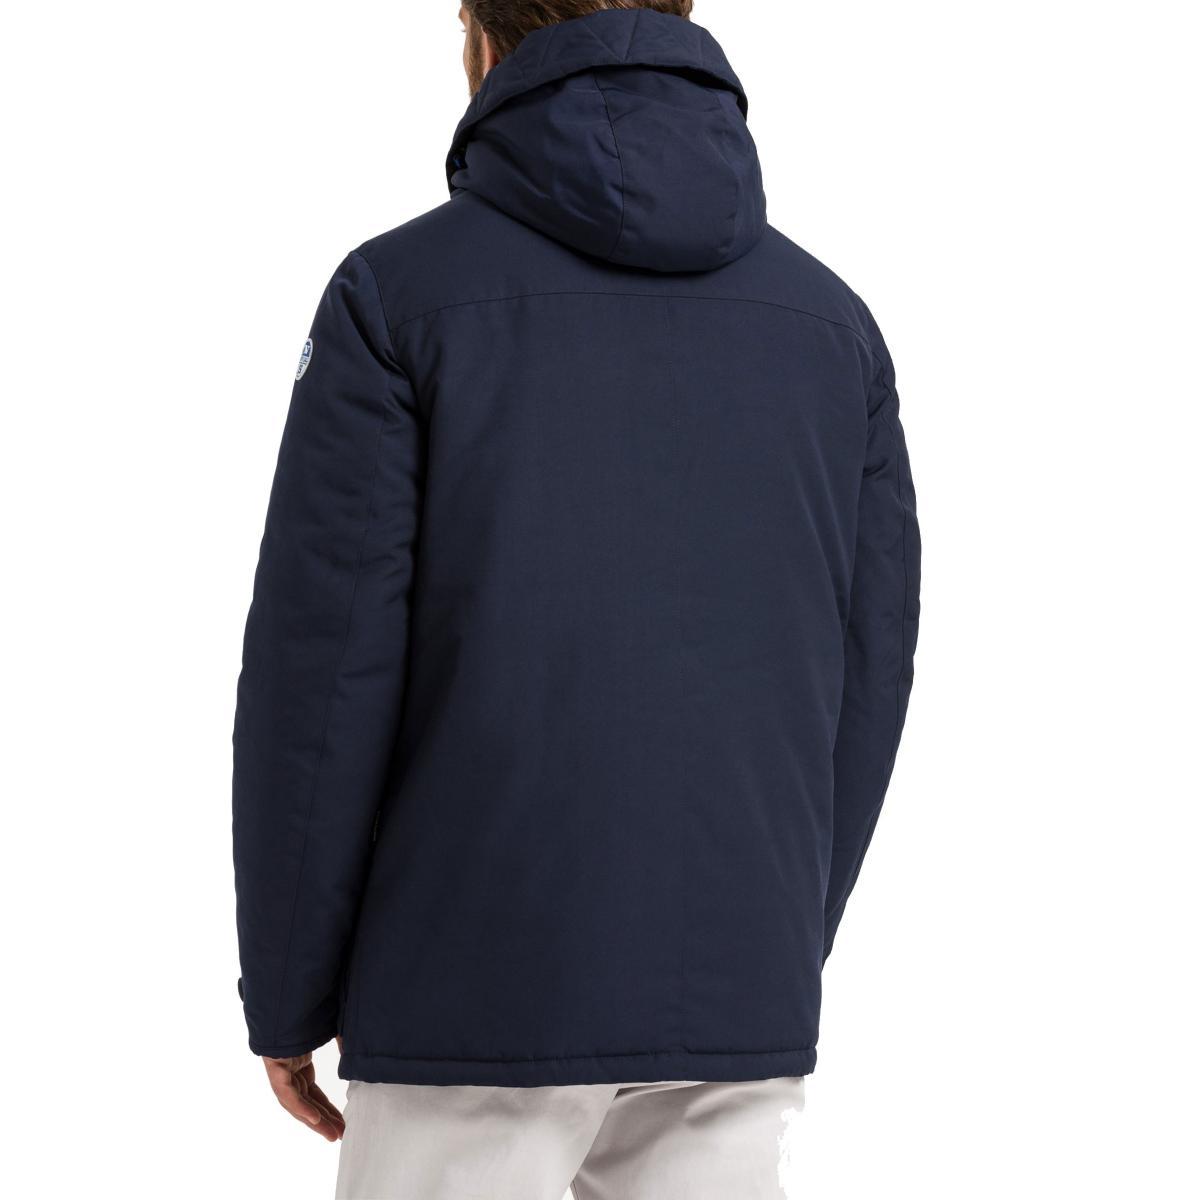 Giubotto Parka North Sails Cardiff Jacket da uomo rif. 602496